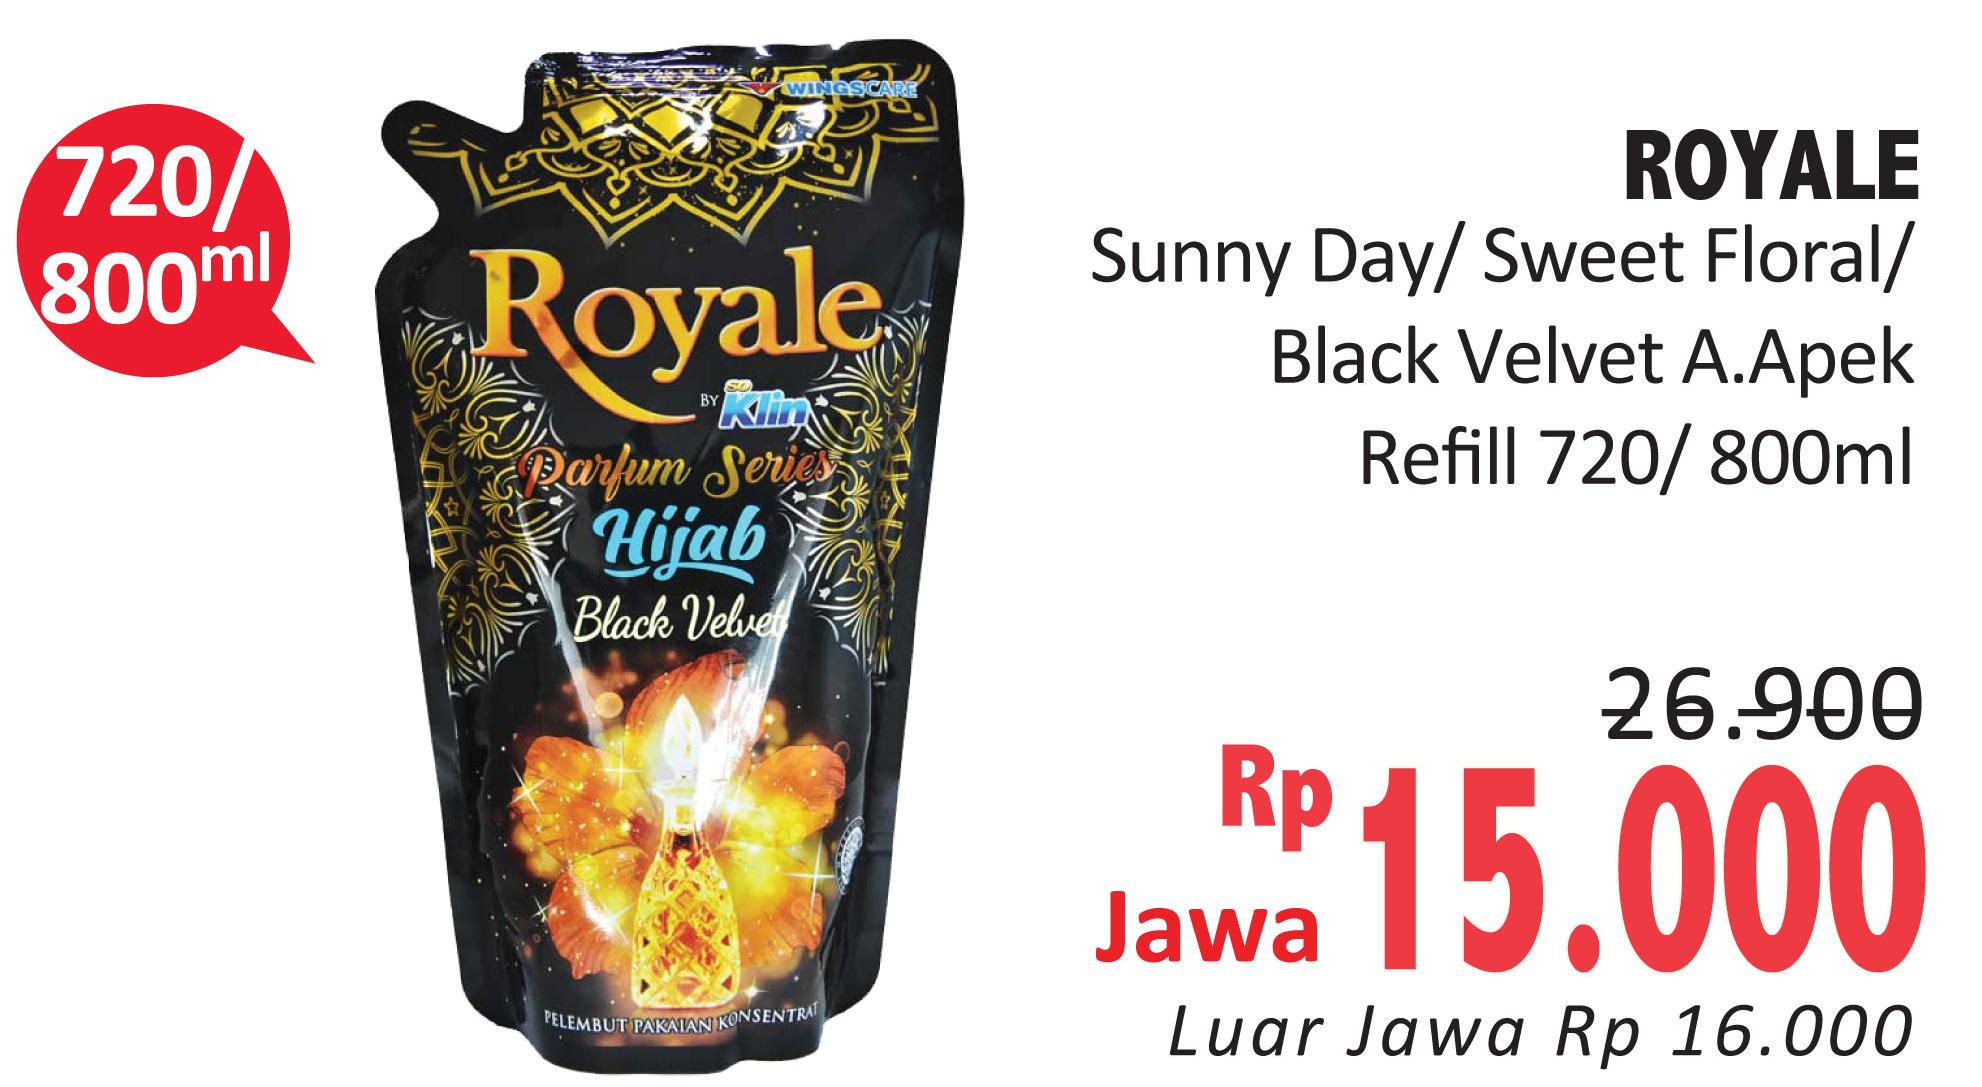 Promo Harga SO KLIN Royale Parfum Collection Black Velvet, Purple Dawn, Sunny Day, Sweet Floral 800 ml - Alfamidi